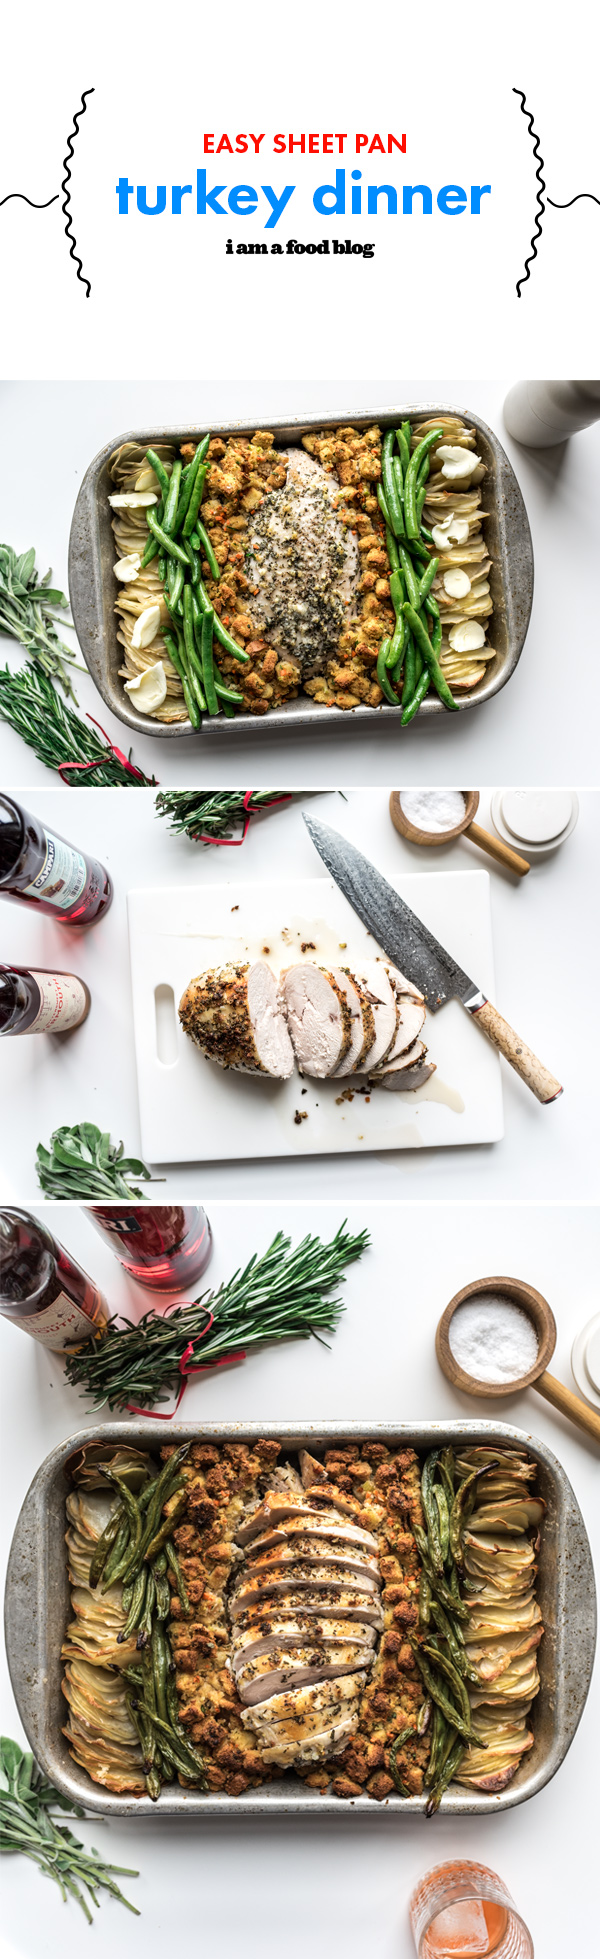 Sheet Pan Turkey Dinner Recipe Whole turkey recipes